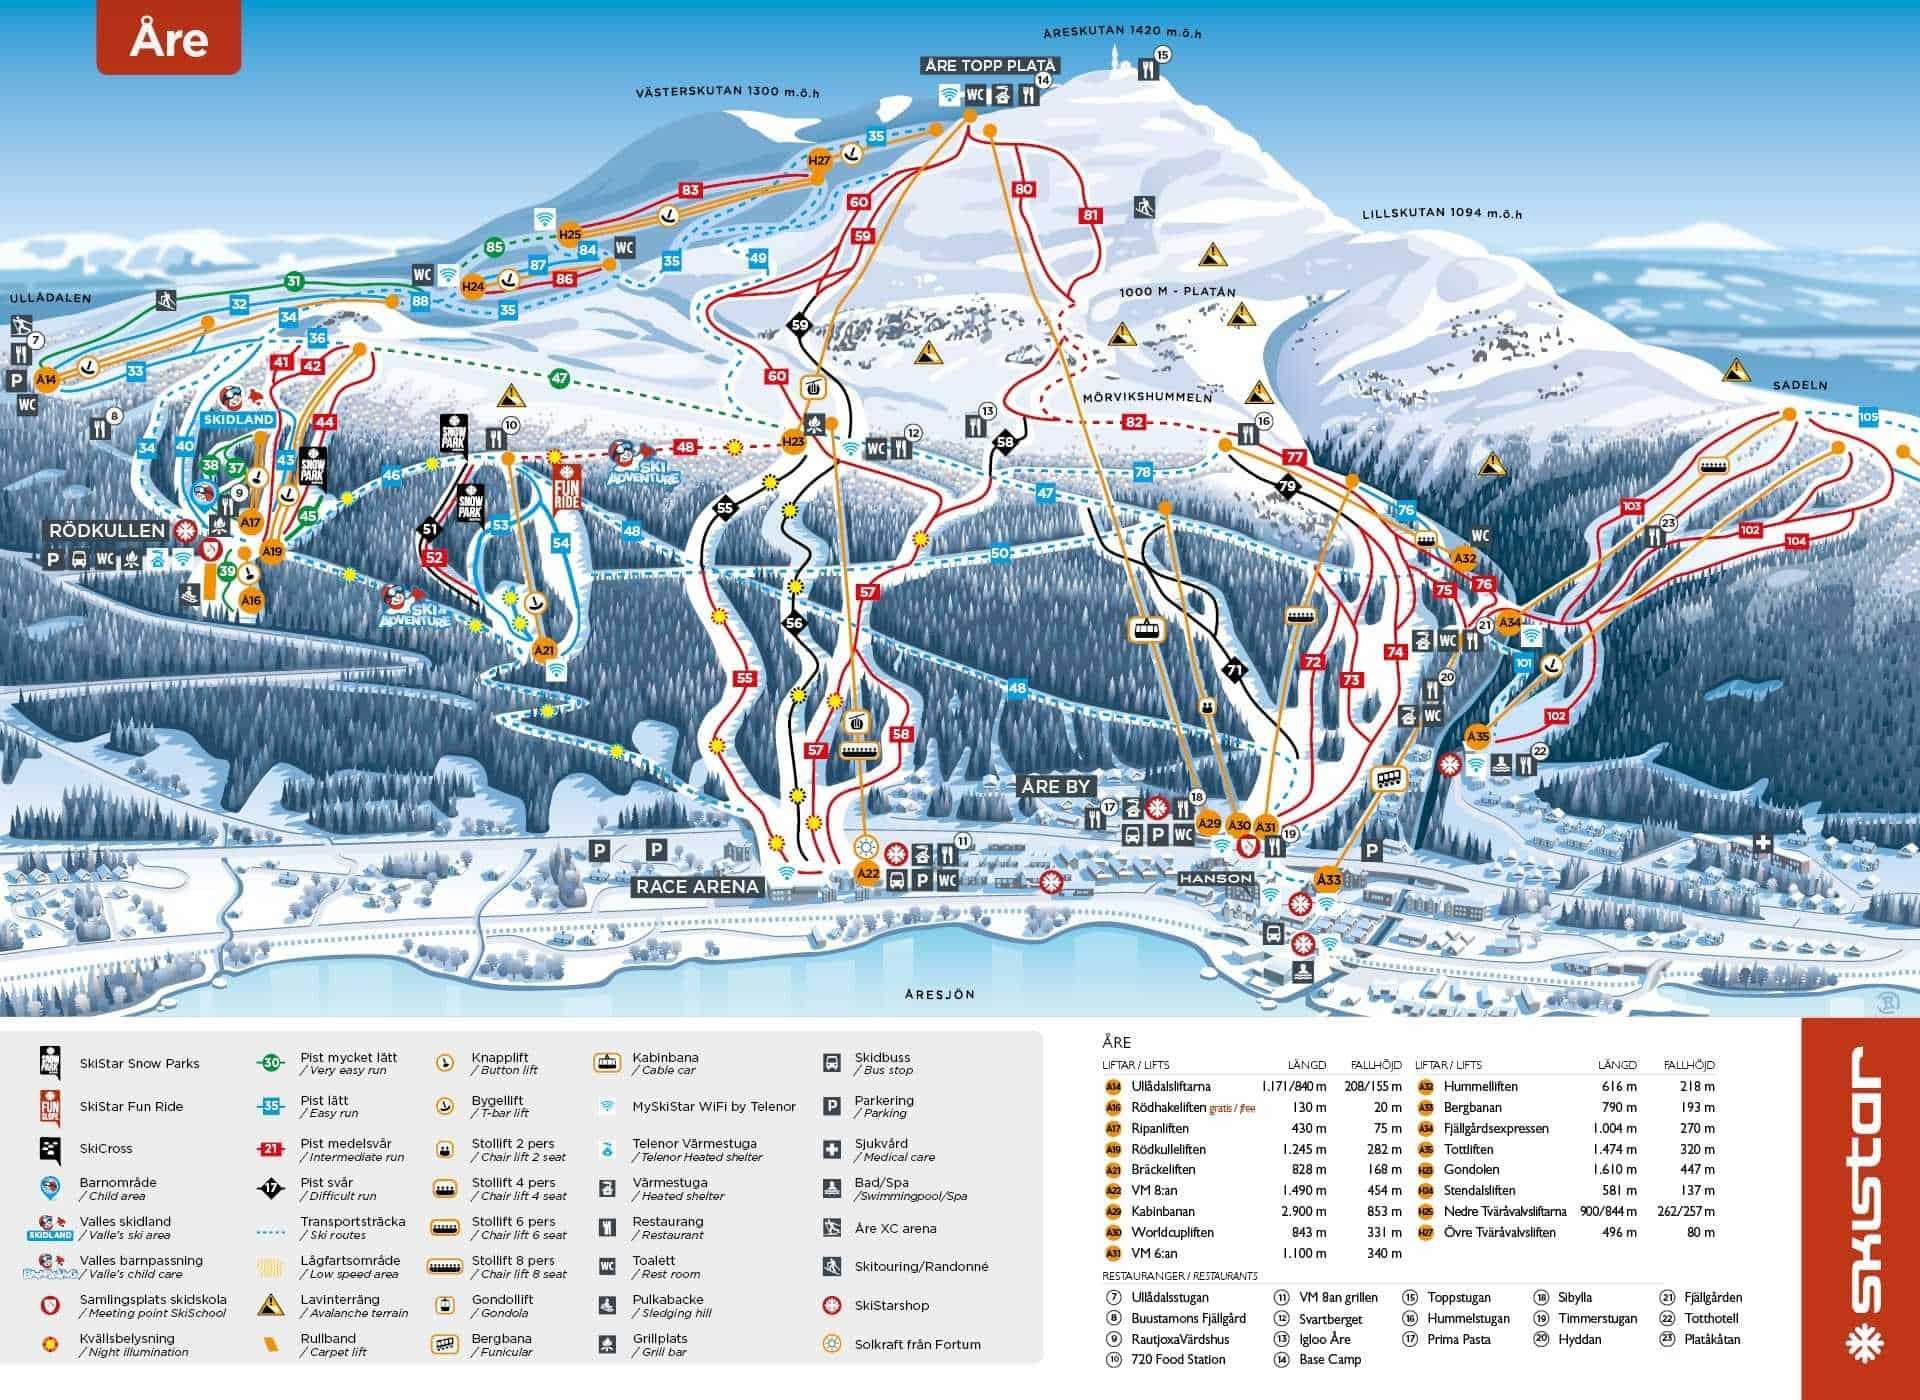 Are Ski Trail Map 2019 optimized